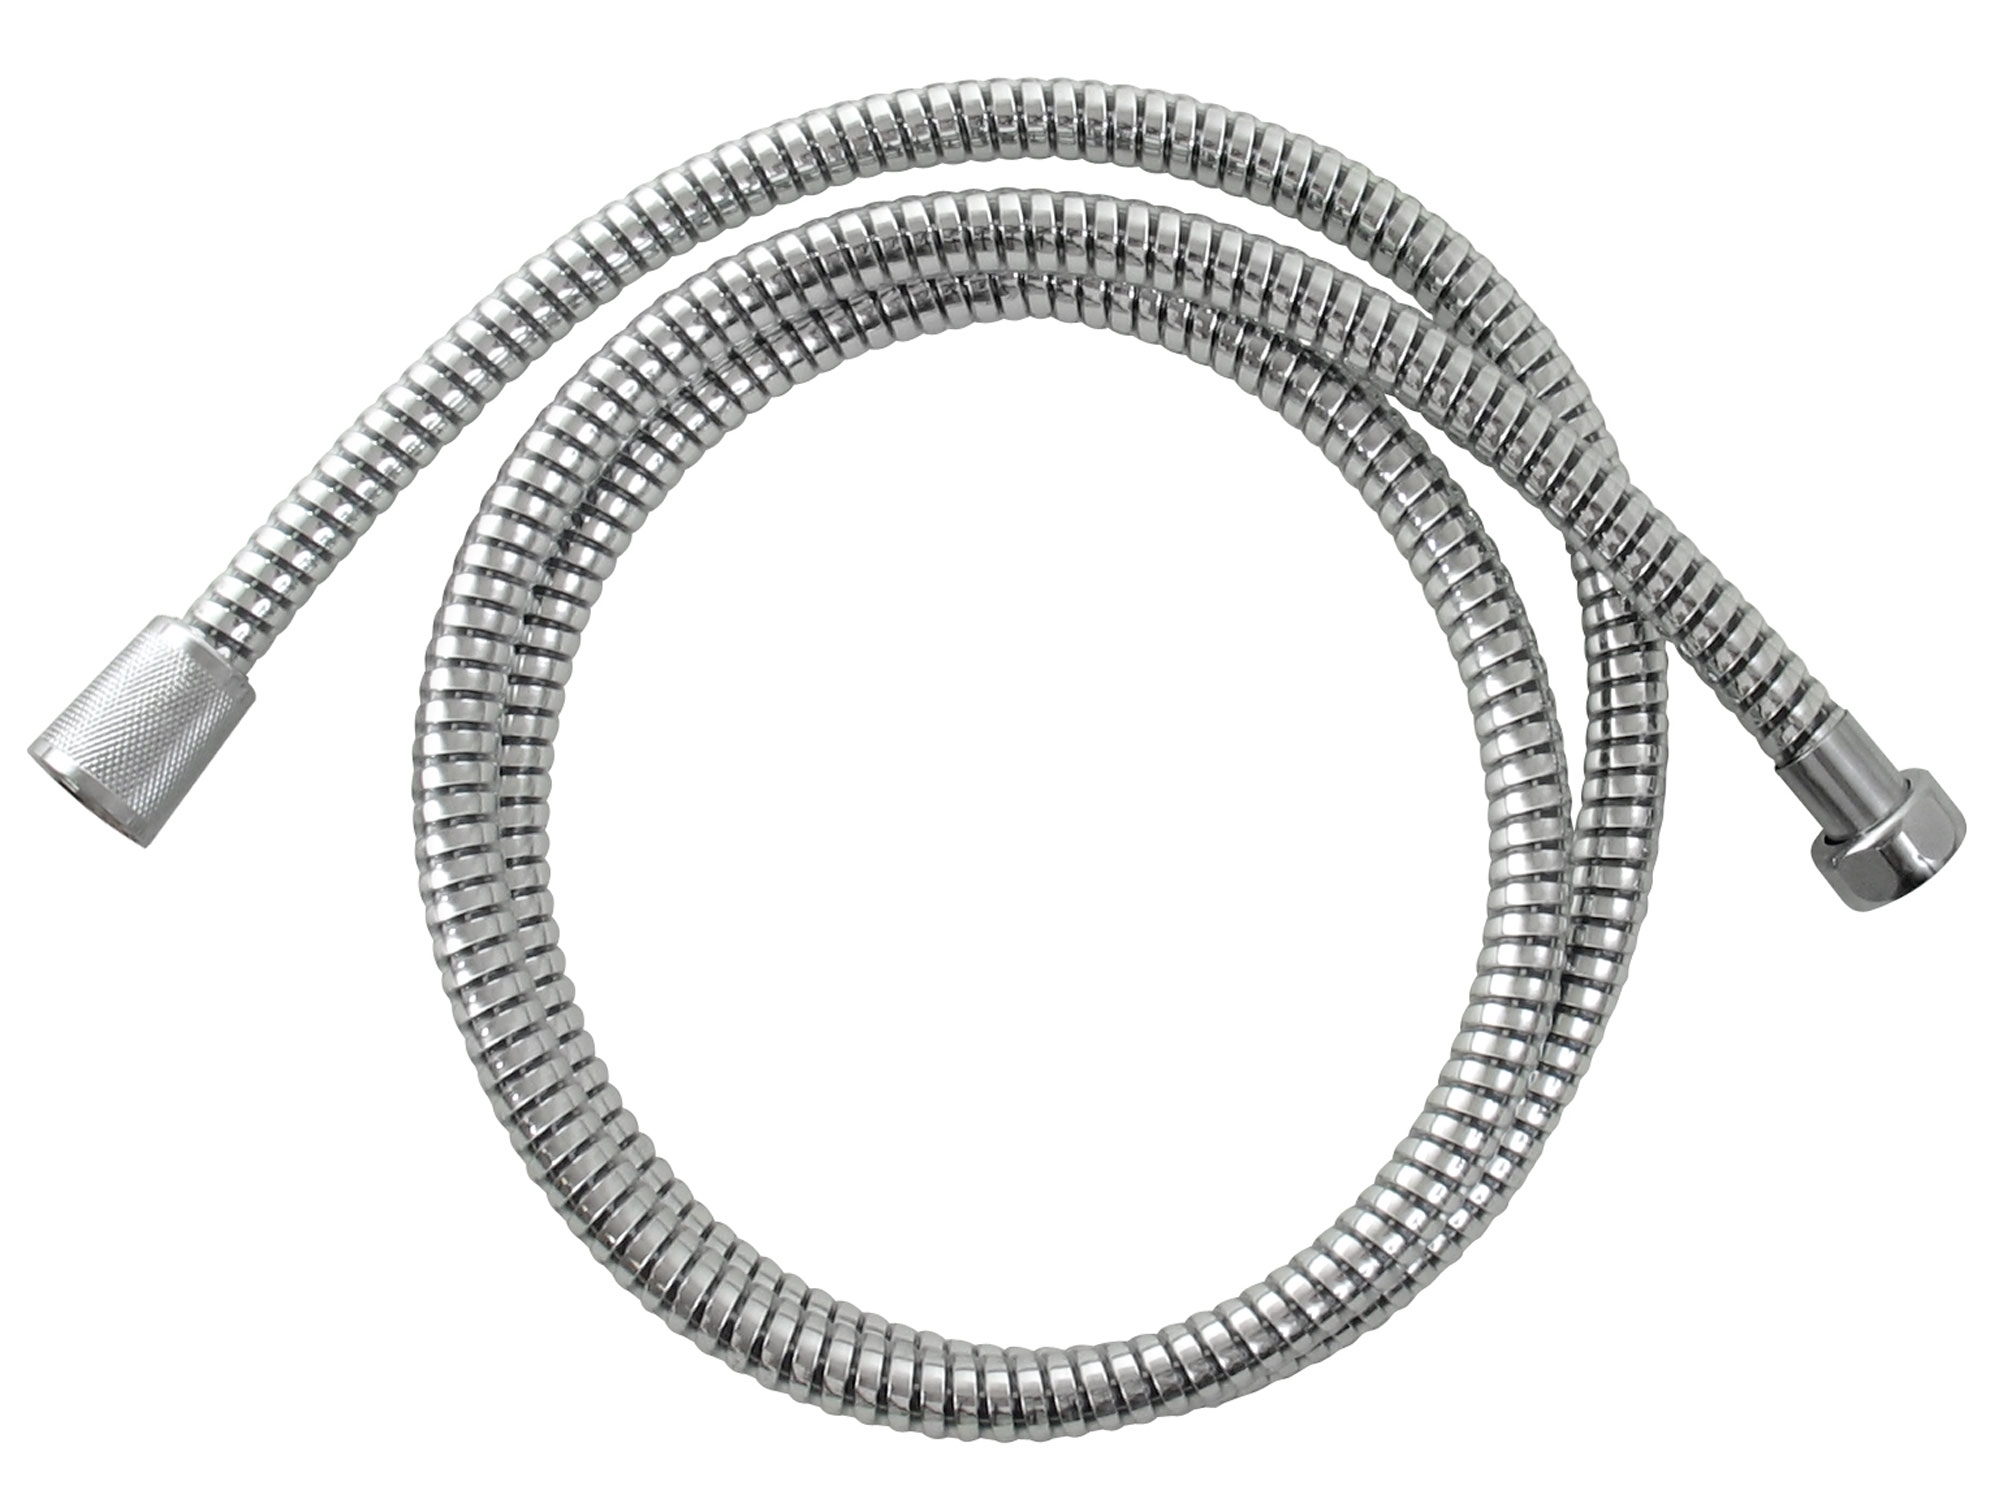 hadice sprchová, černo/stříbrná, 150cm, PVC, FRESHHH 830228